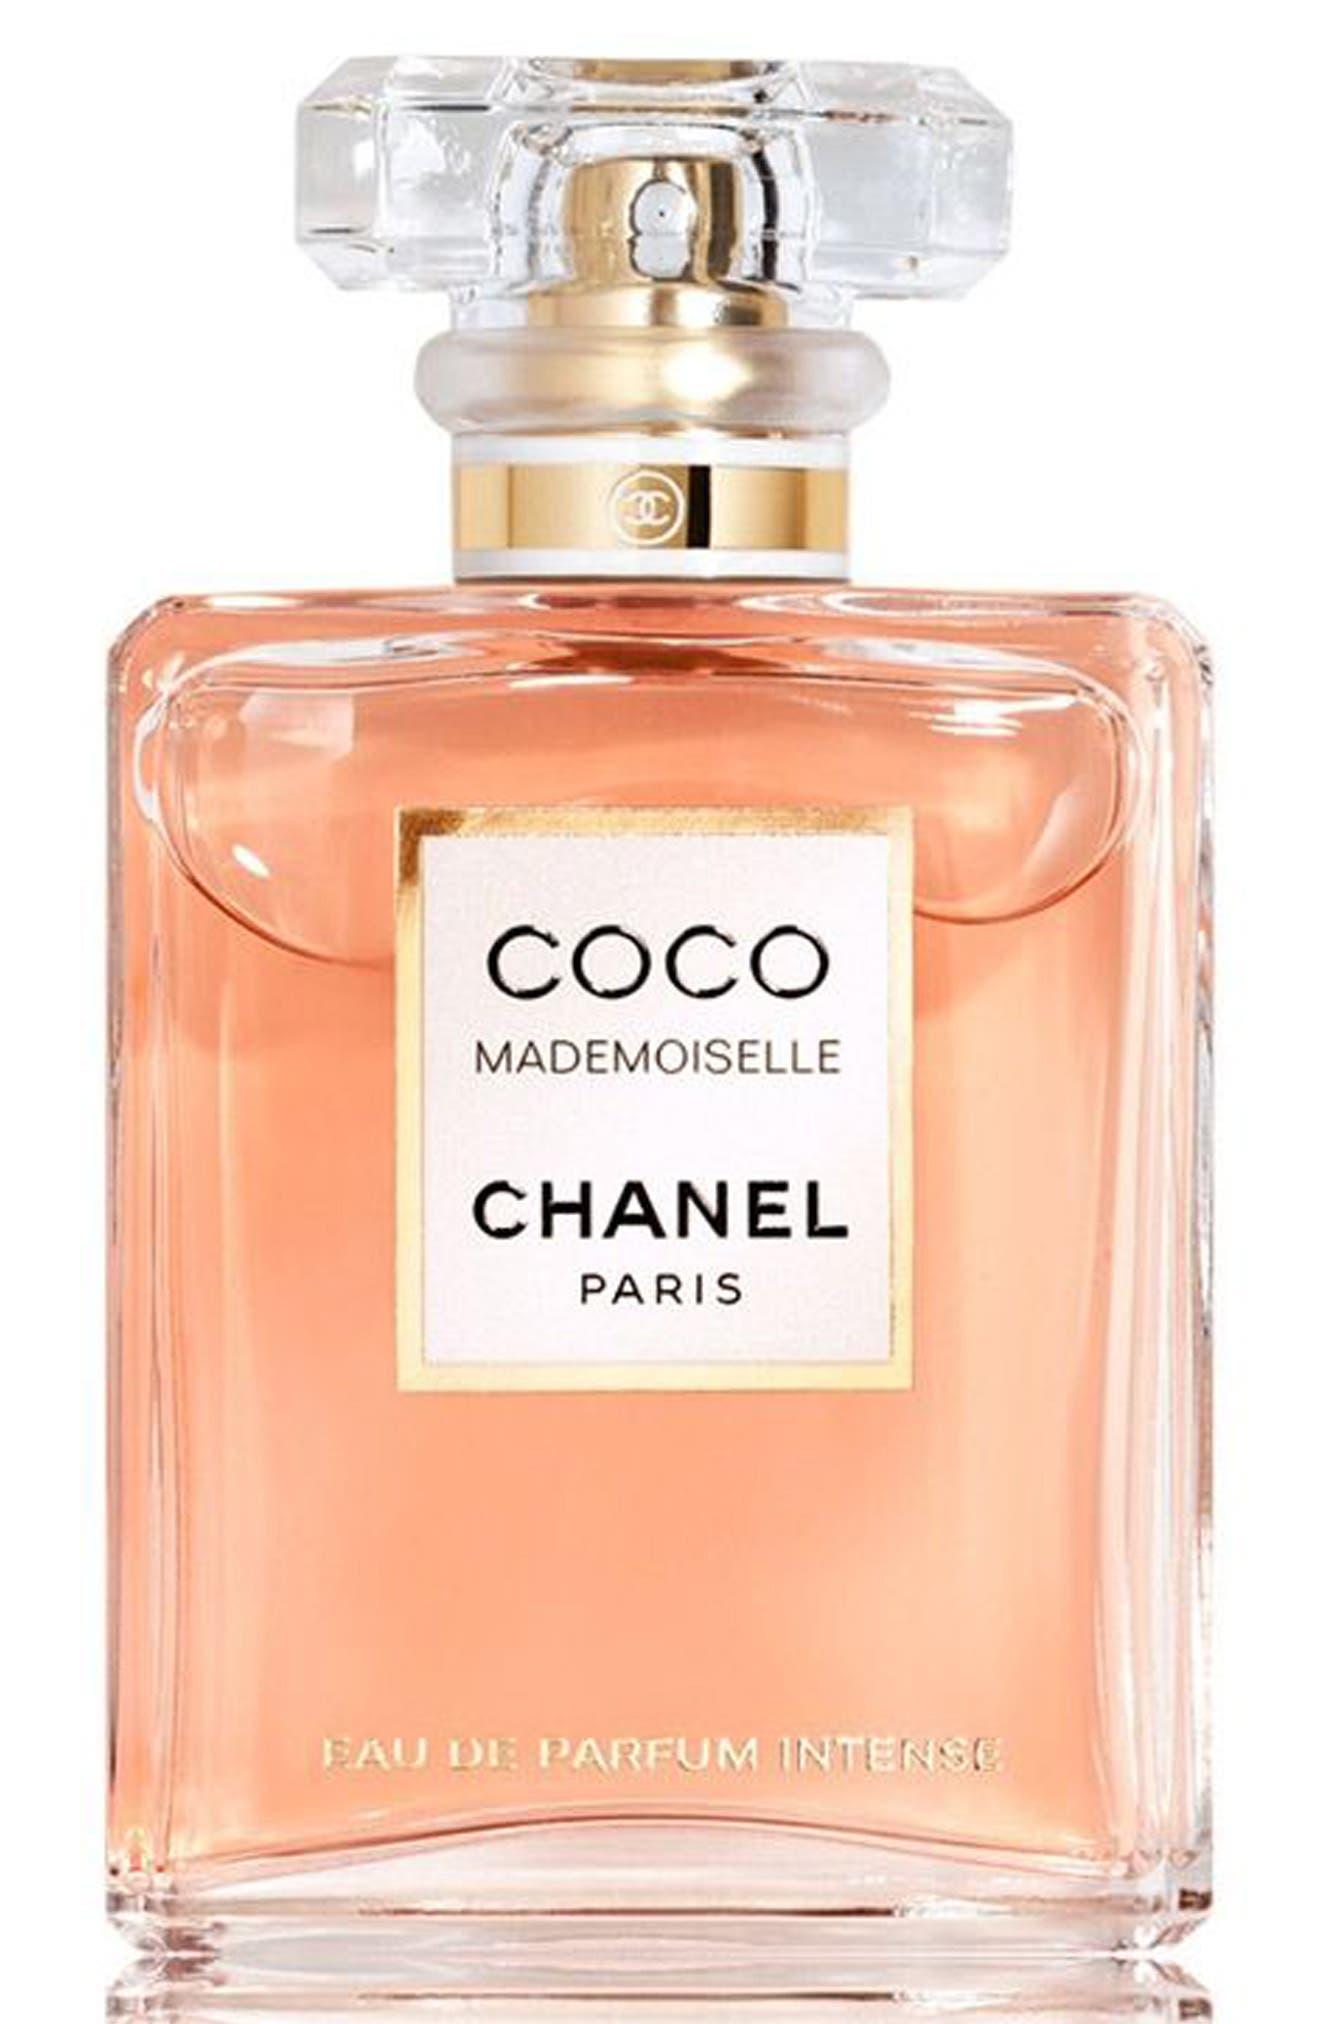 Alternate Image 1 Selected - CHANEL COCO MADEMOISELLE  Eau de Parfum Intense